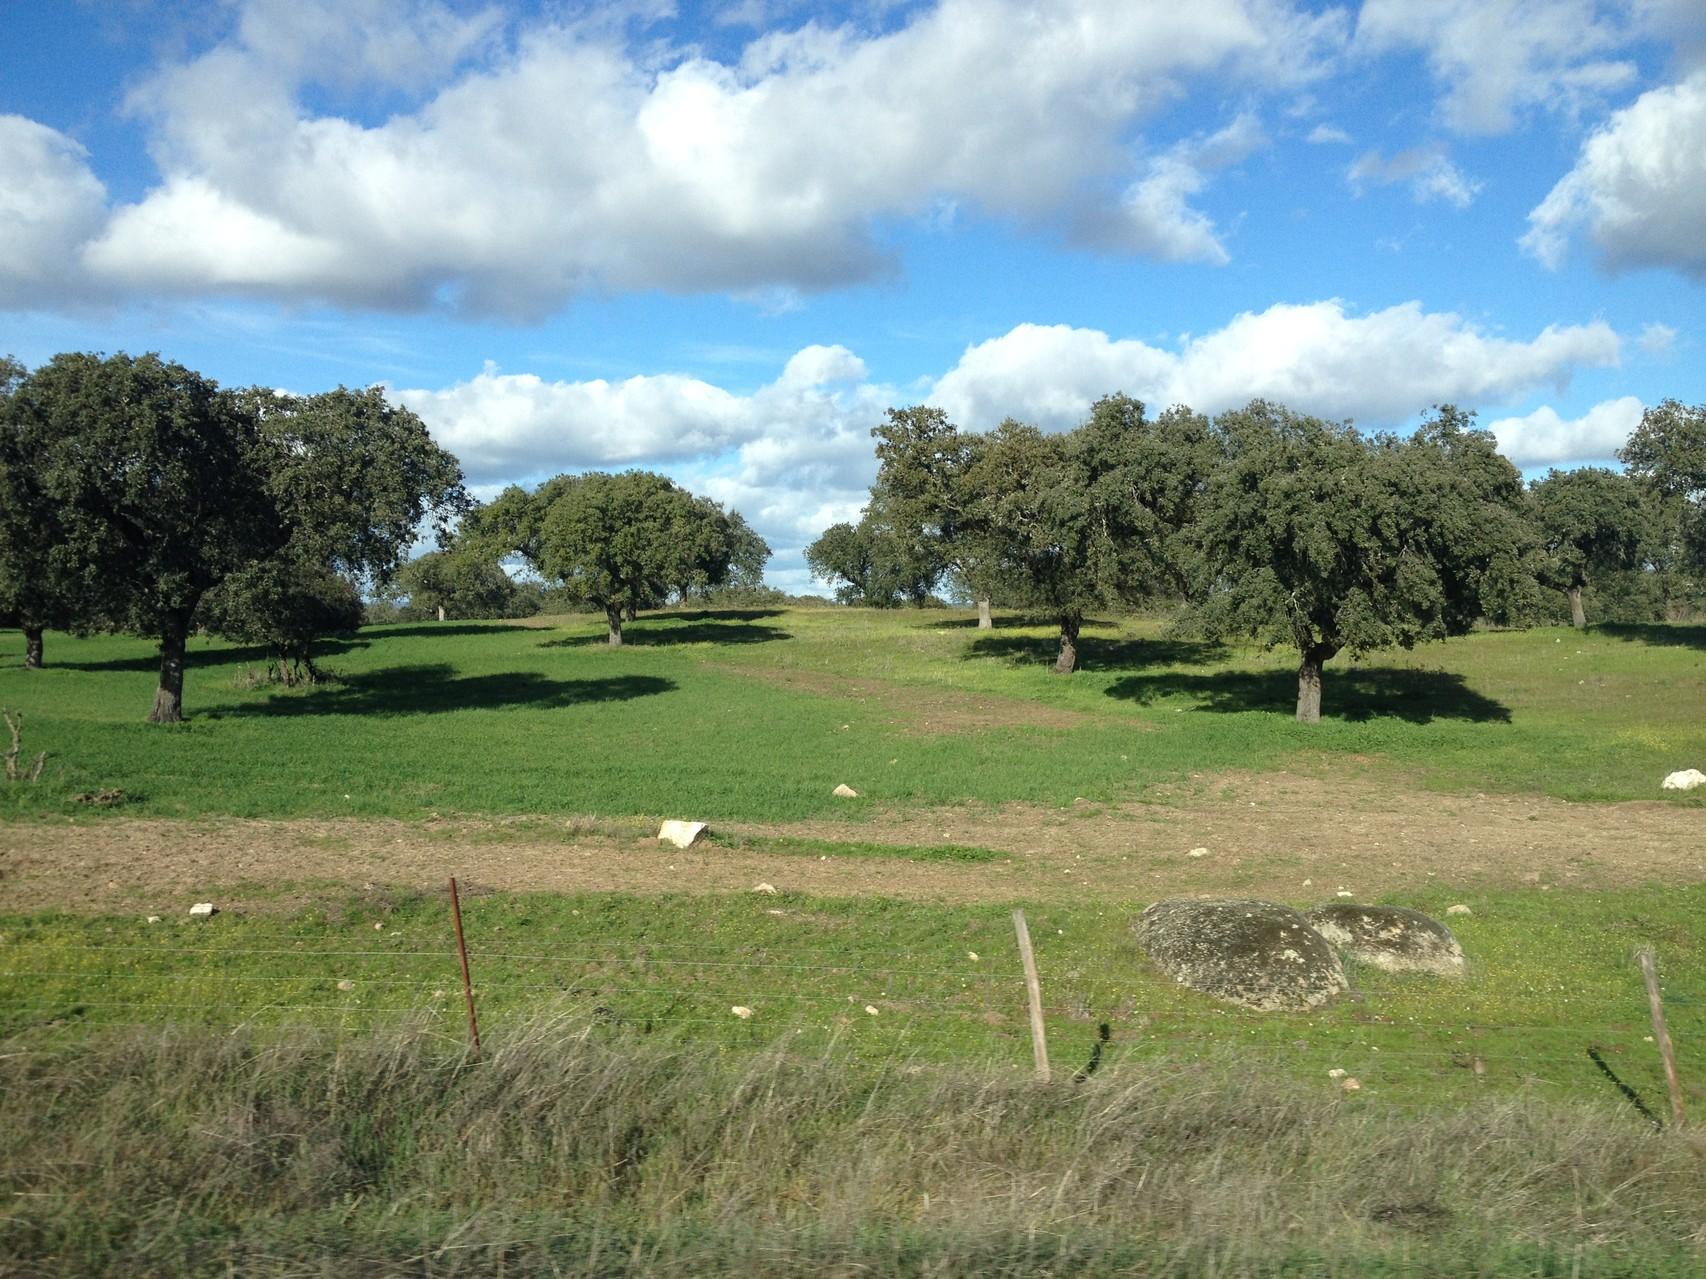 Schöne Felder